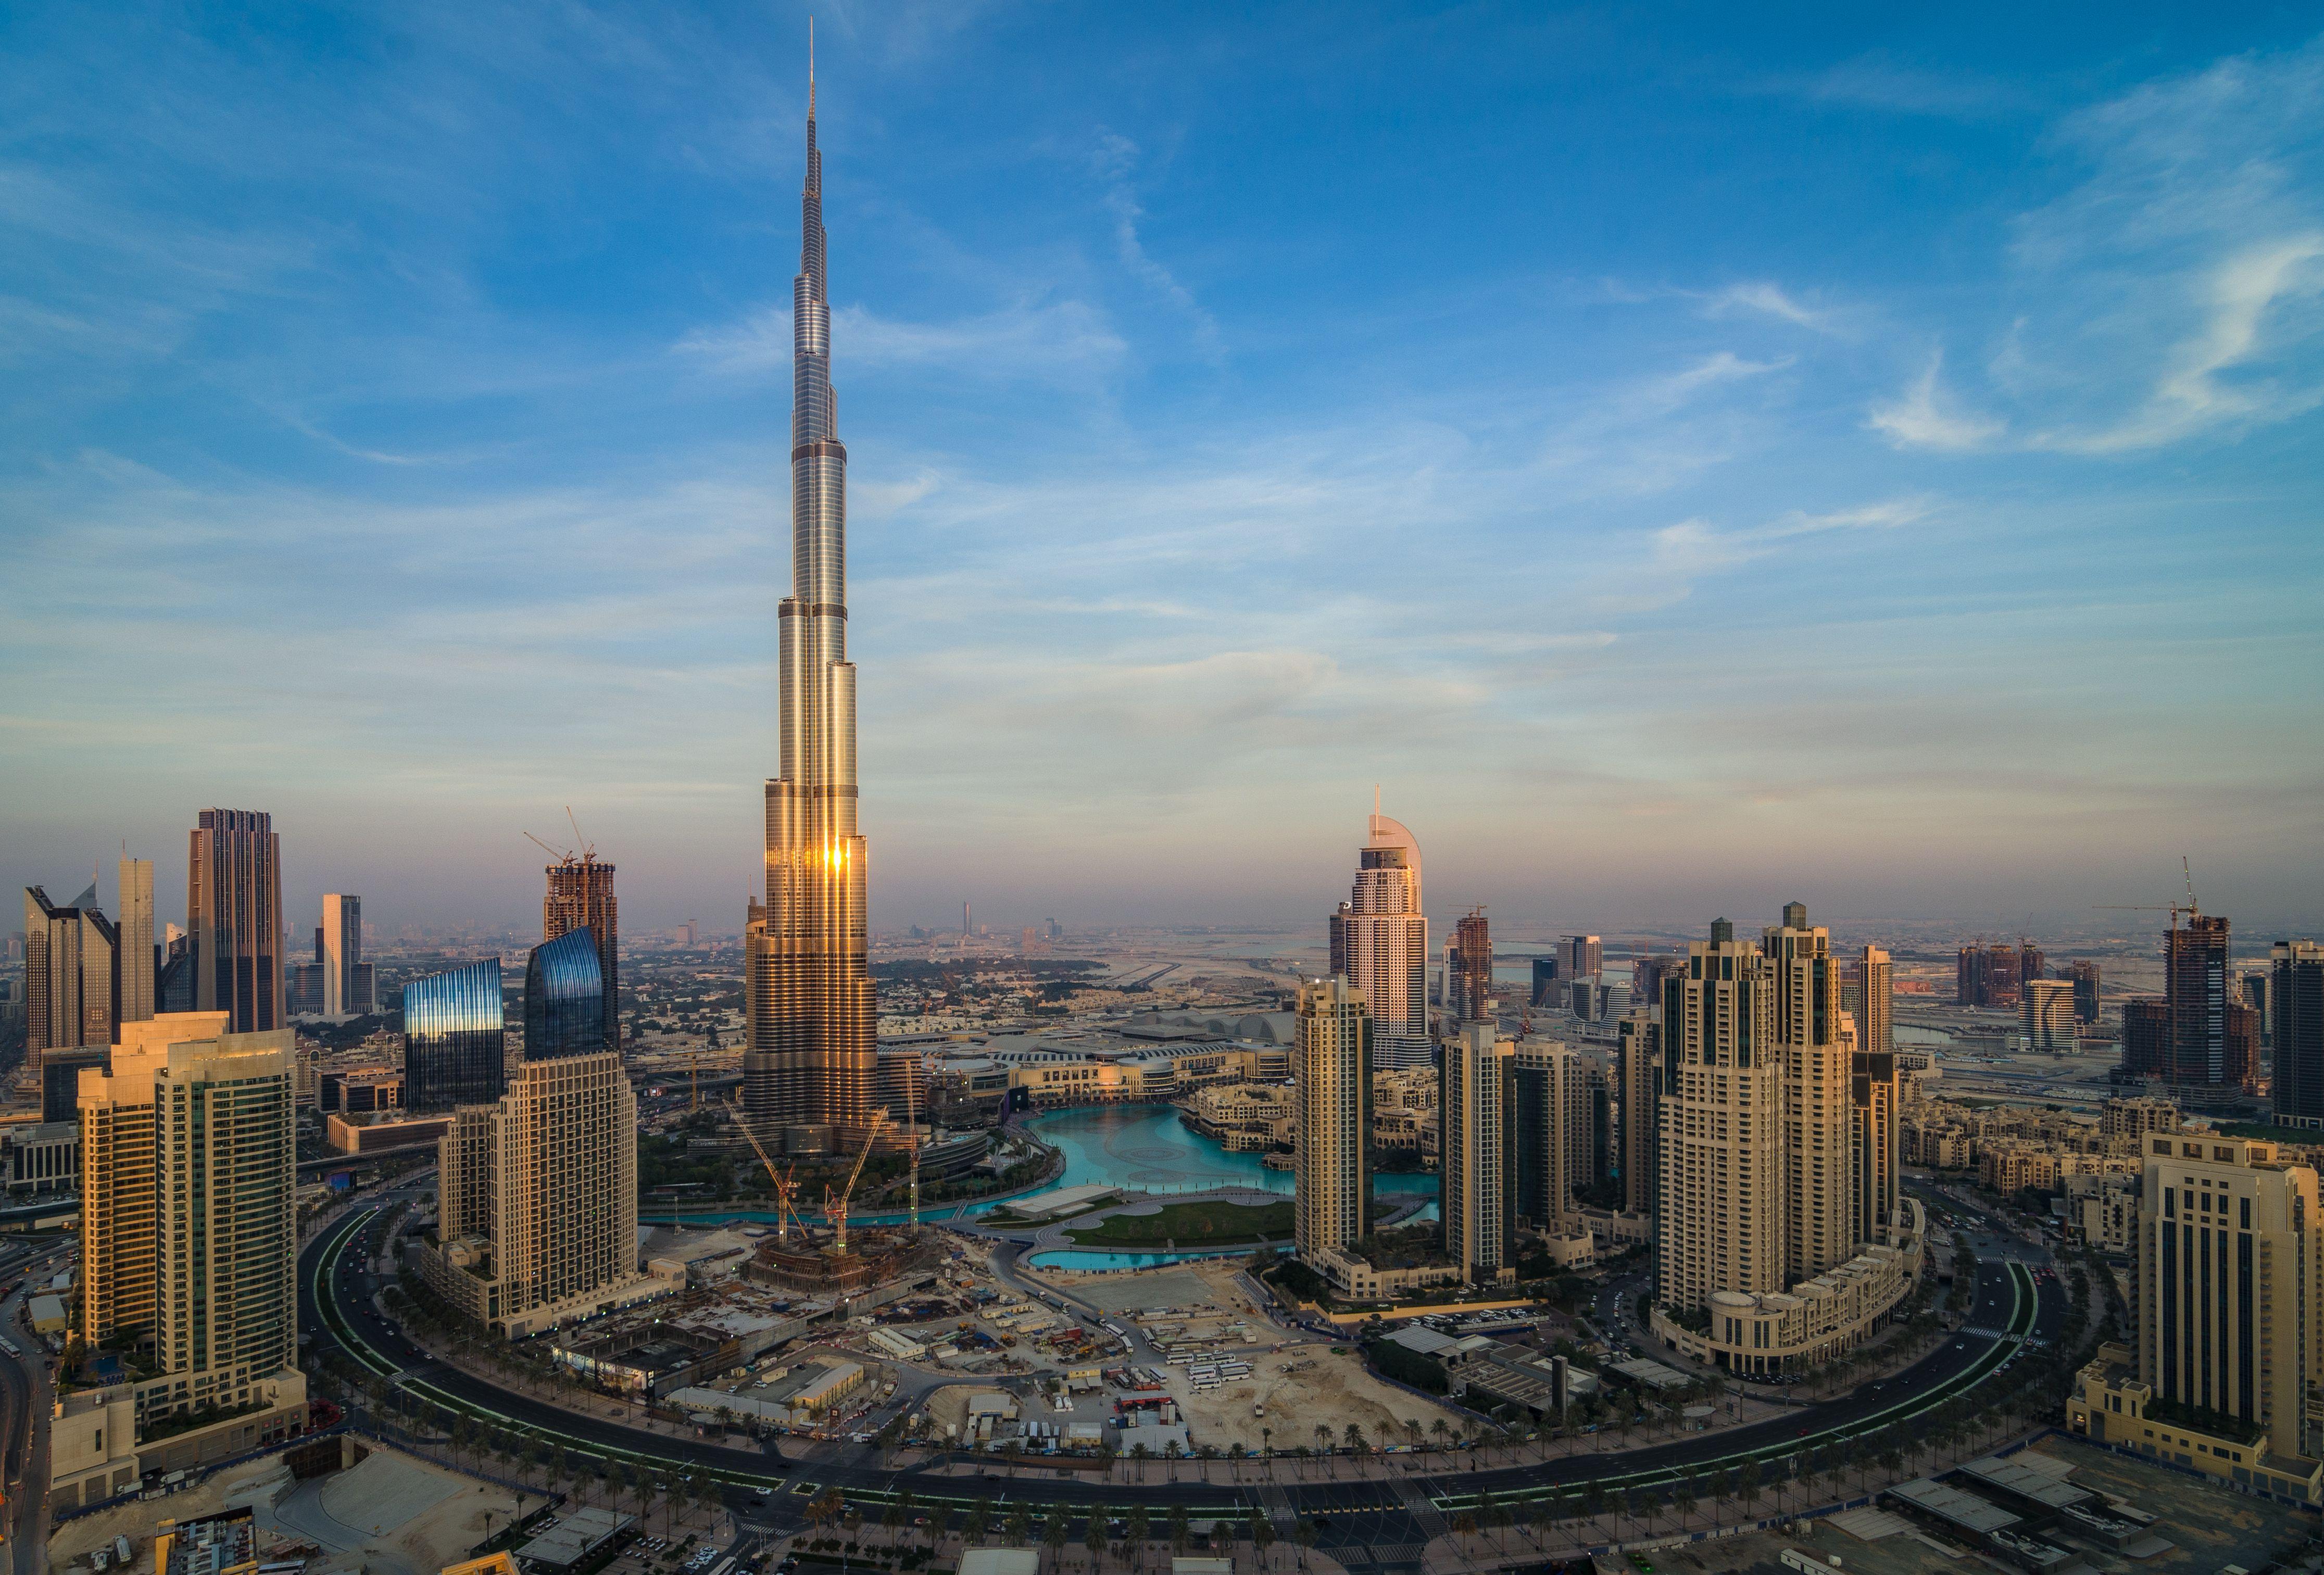 el imponente burj khalifa el edificio ms alto del mundo esta en dubai